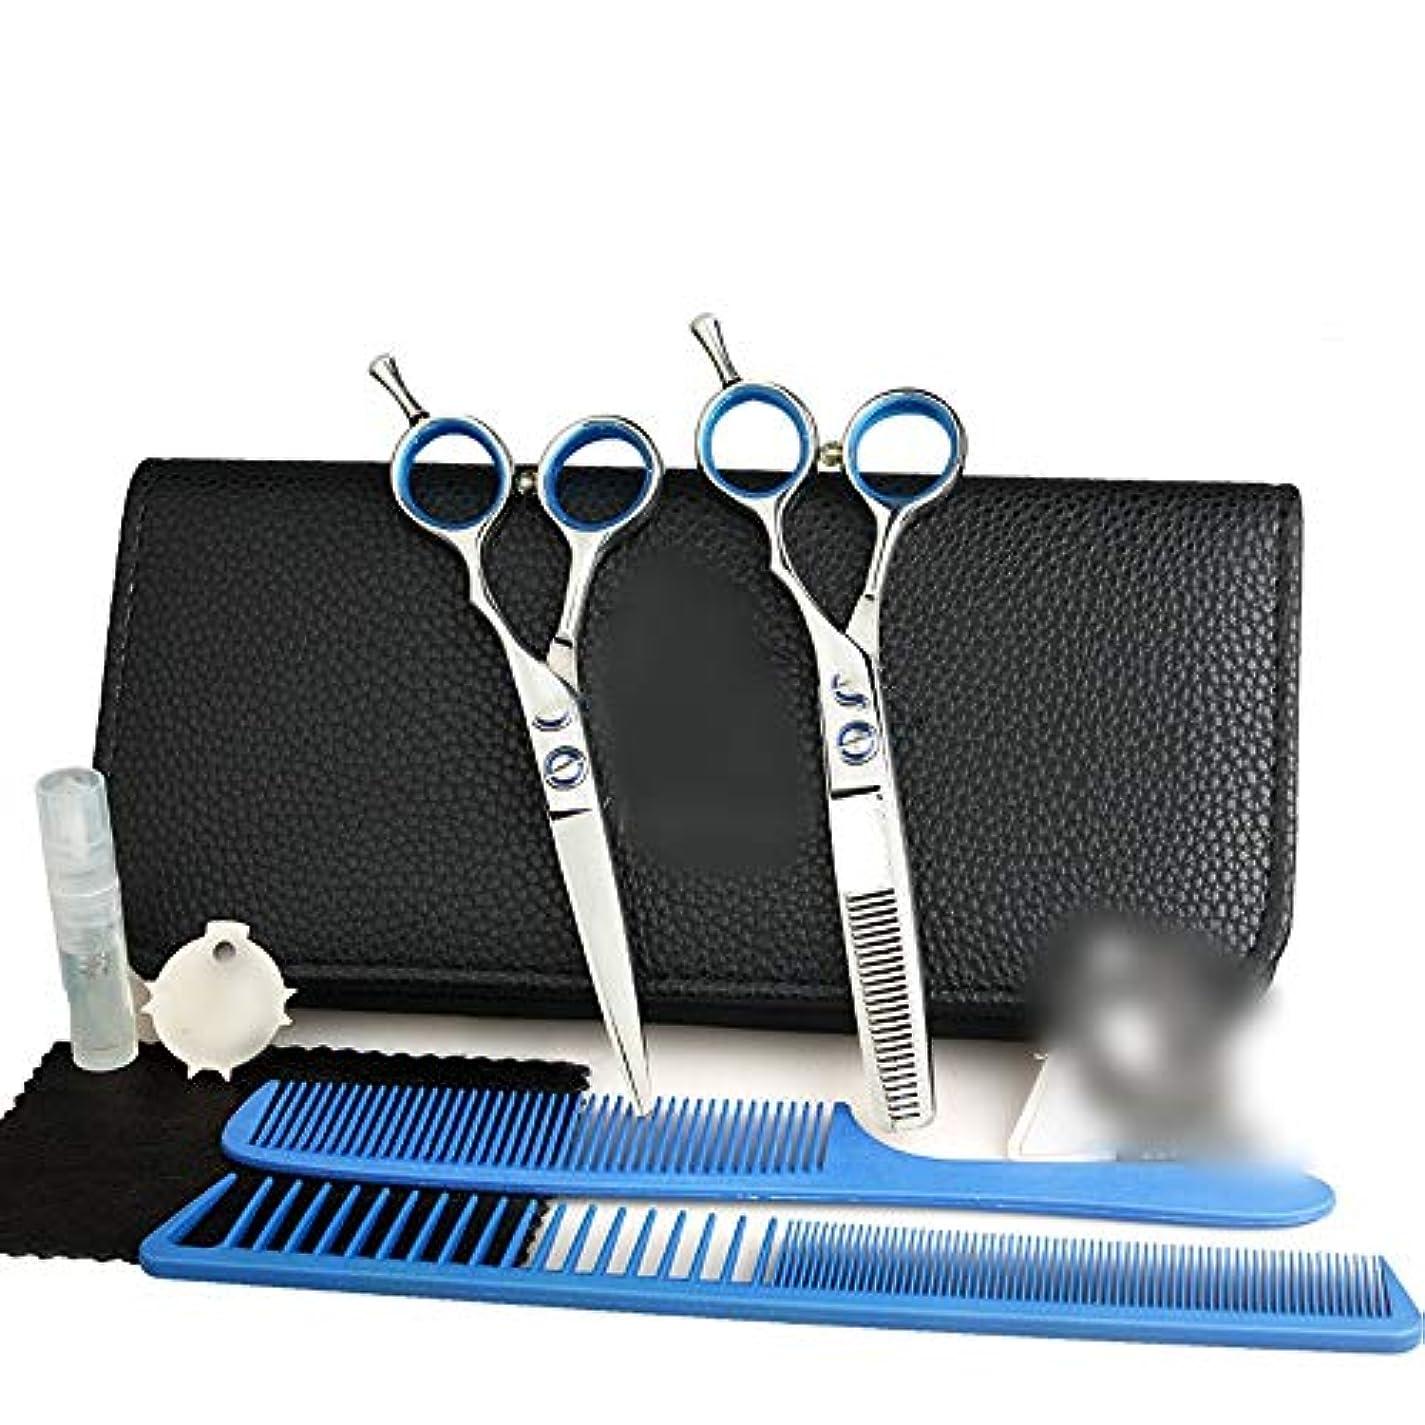 Goodsok-jp 5.5インチ理髪はさみセット、平らな歯のはさみ理髪はさみセット (色 : Silver)